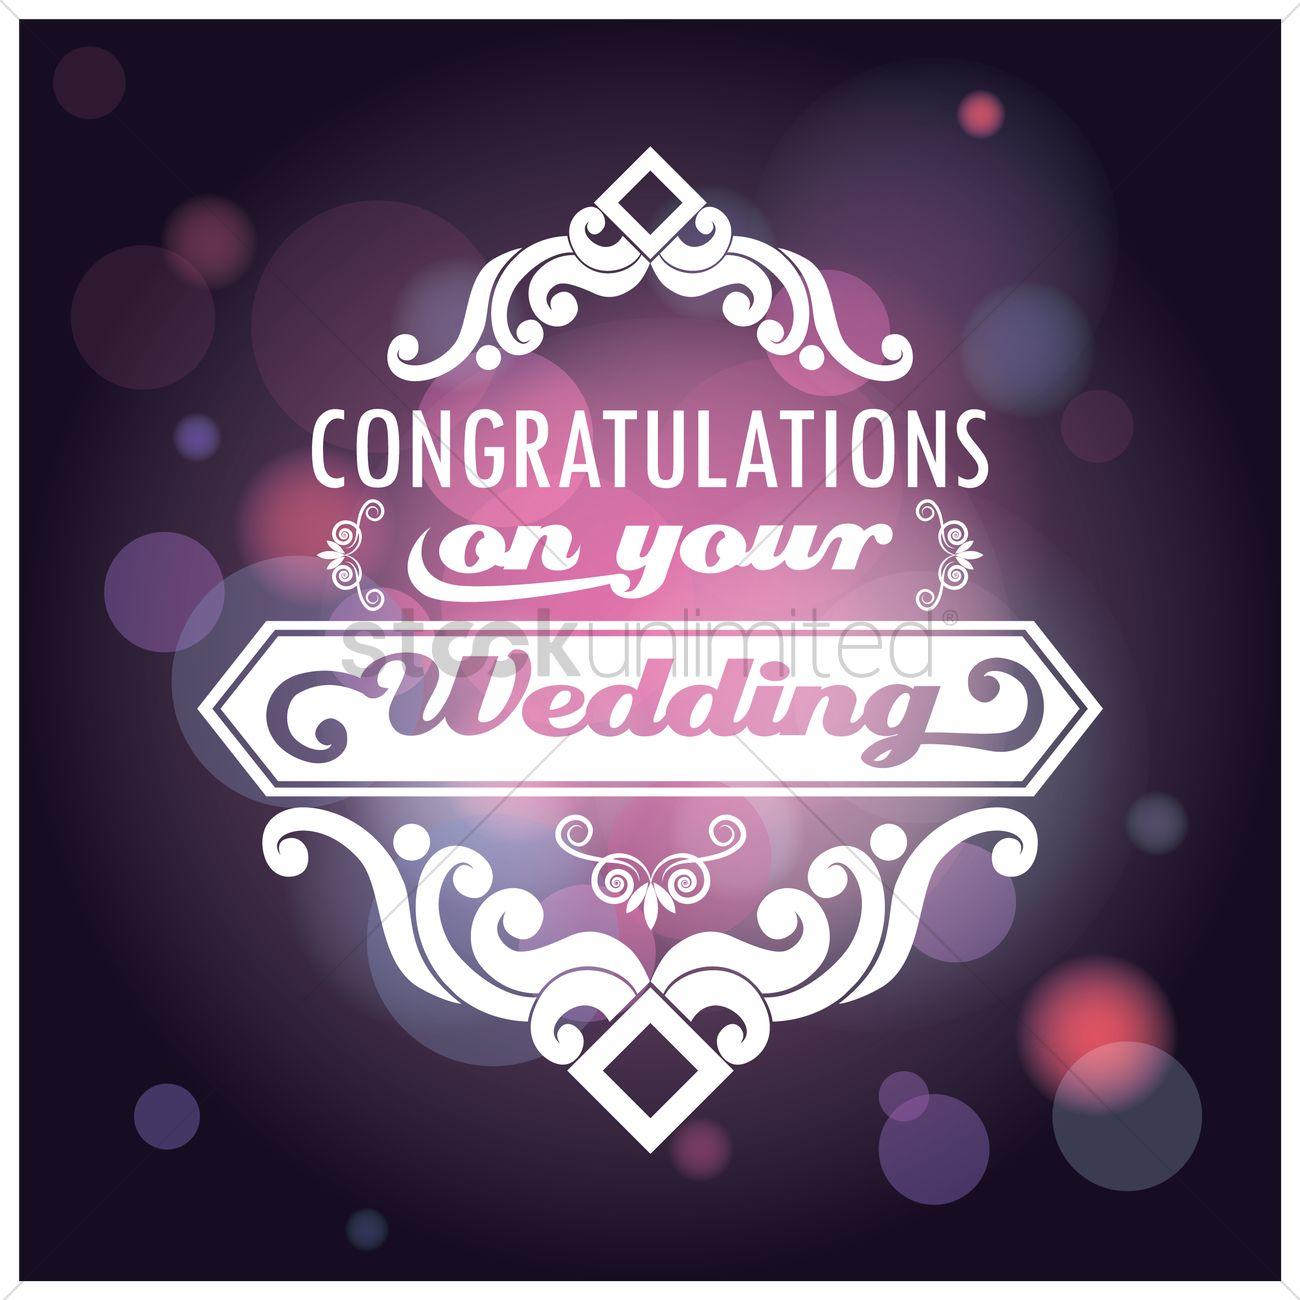 Congratulations On Your Wedding Card Vector Image